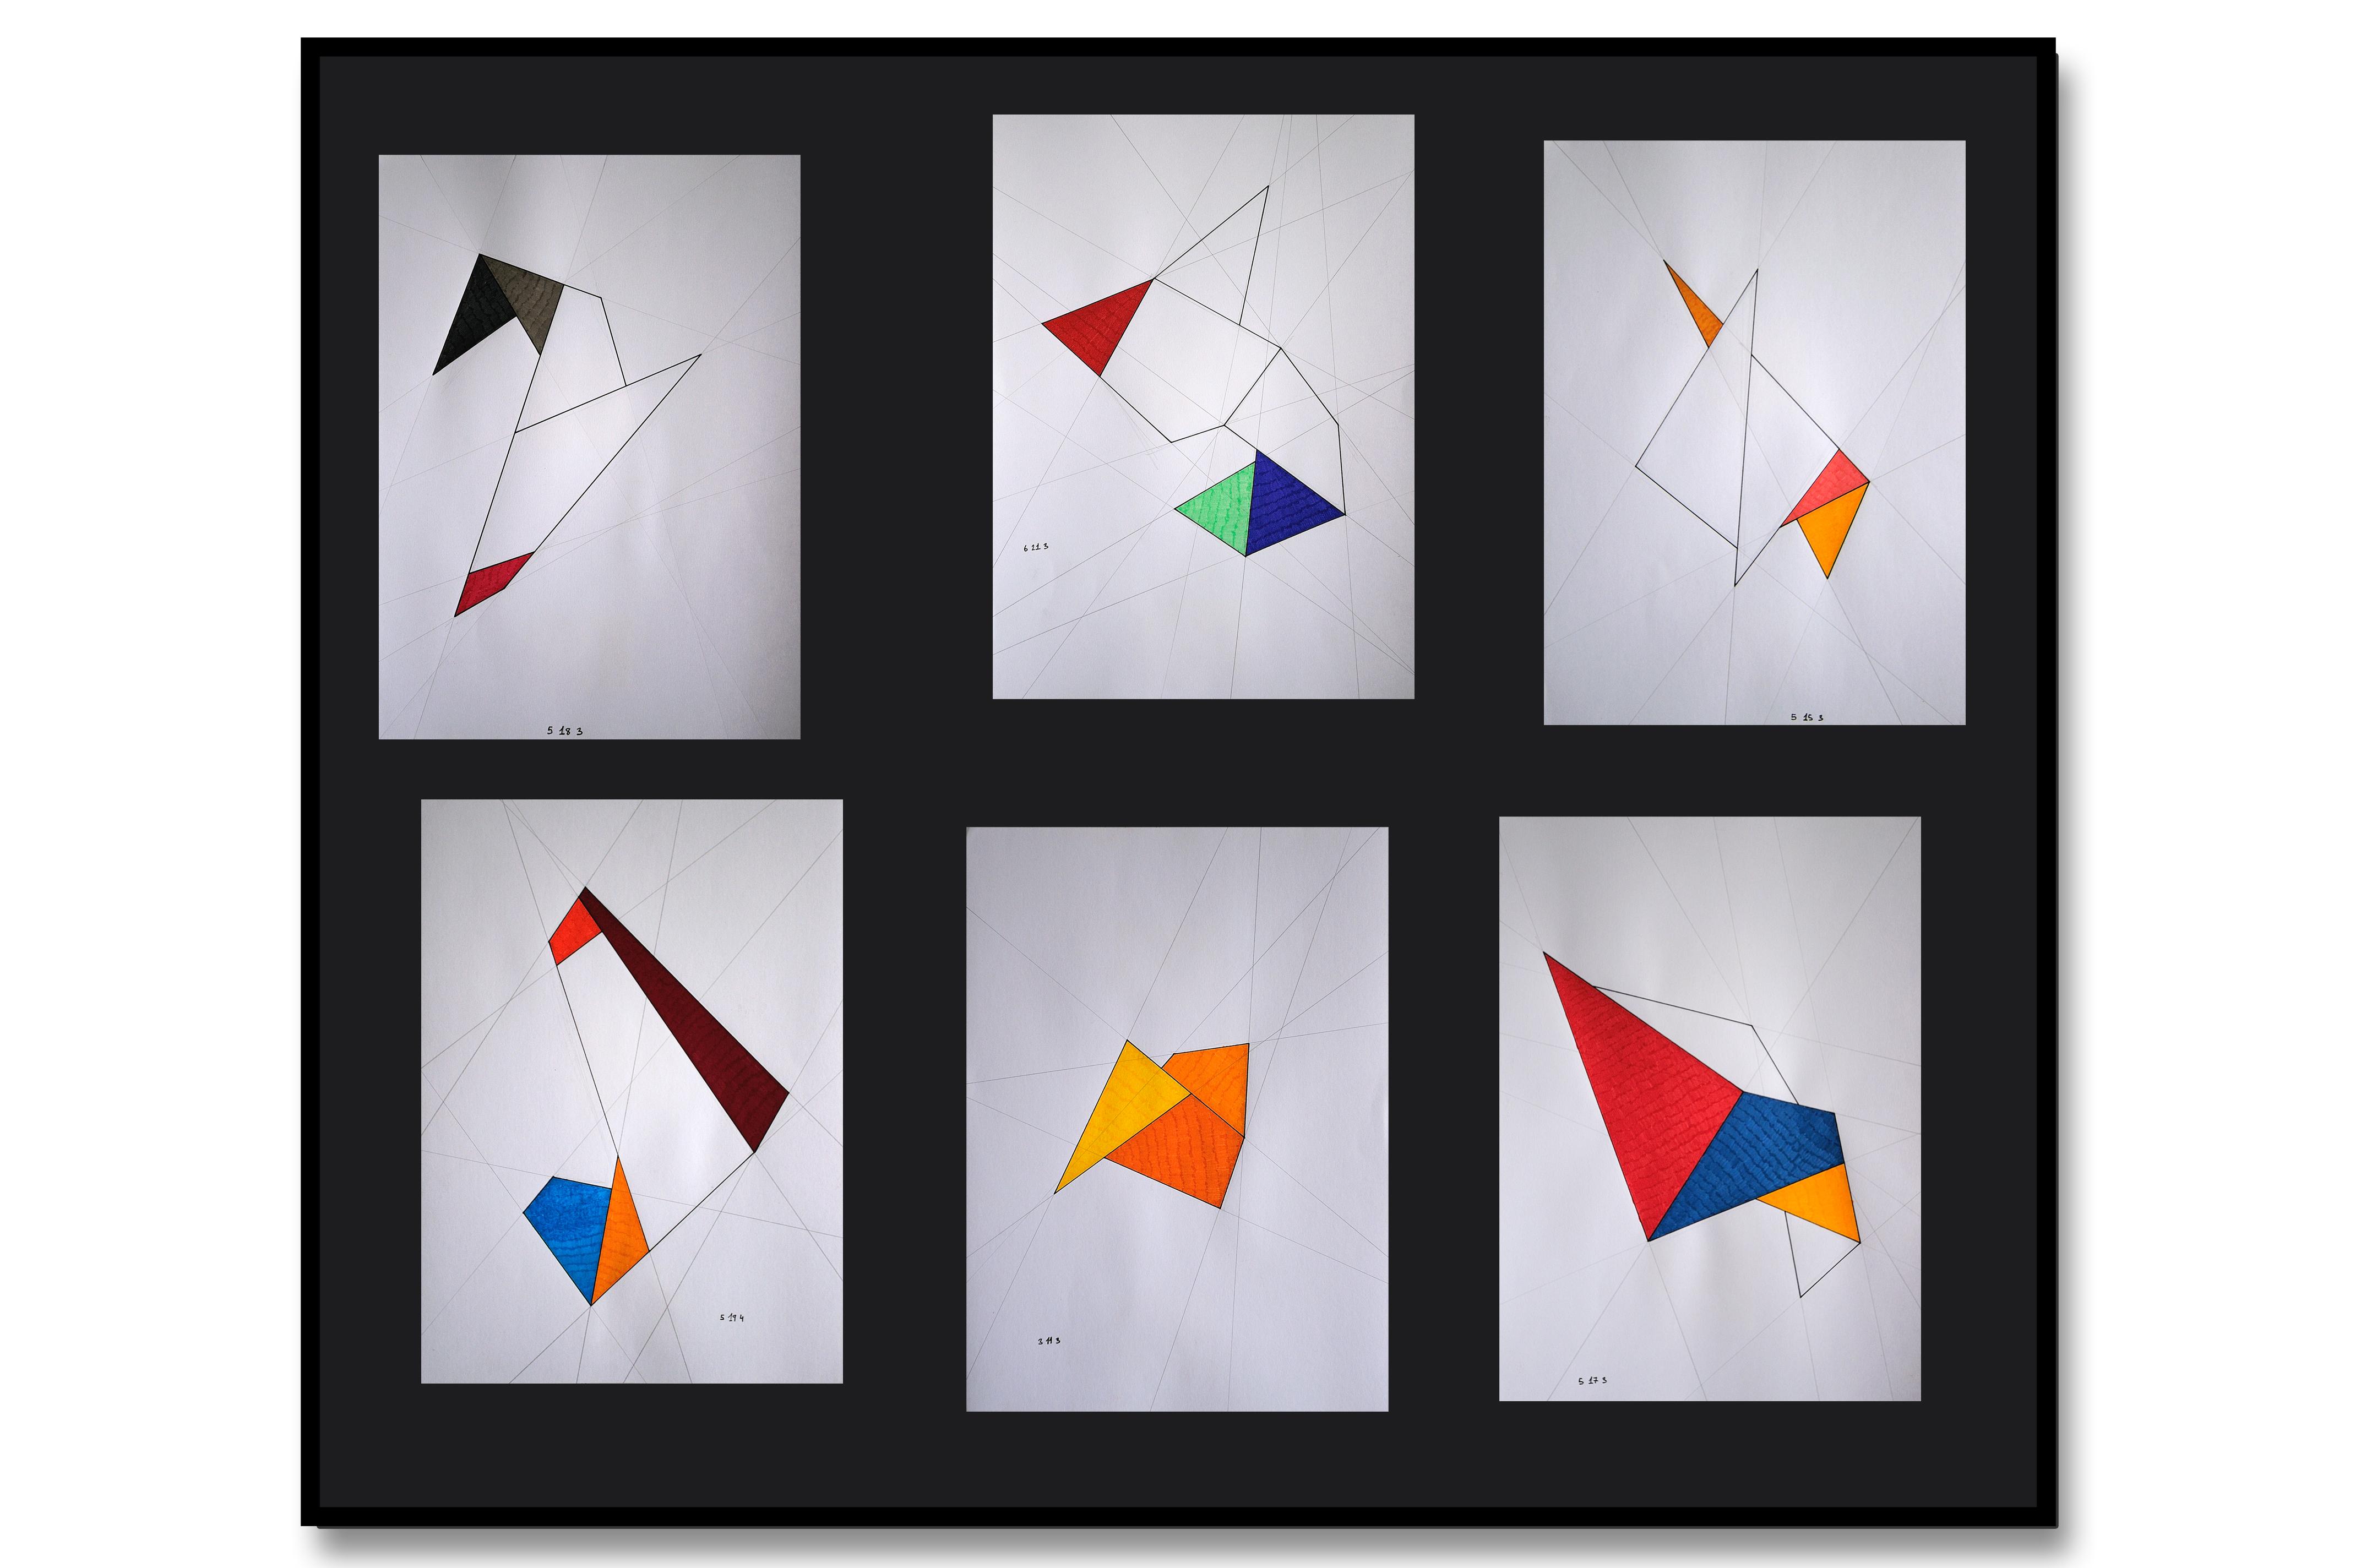 geometria-seis-100x70-2016-sin-cartela